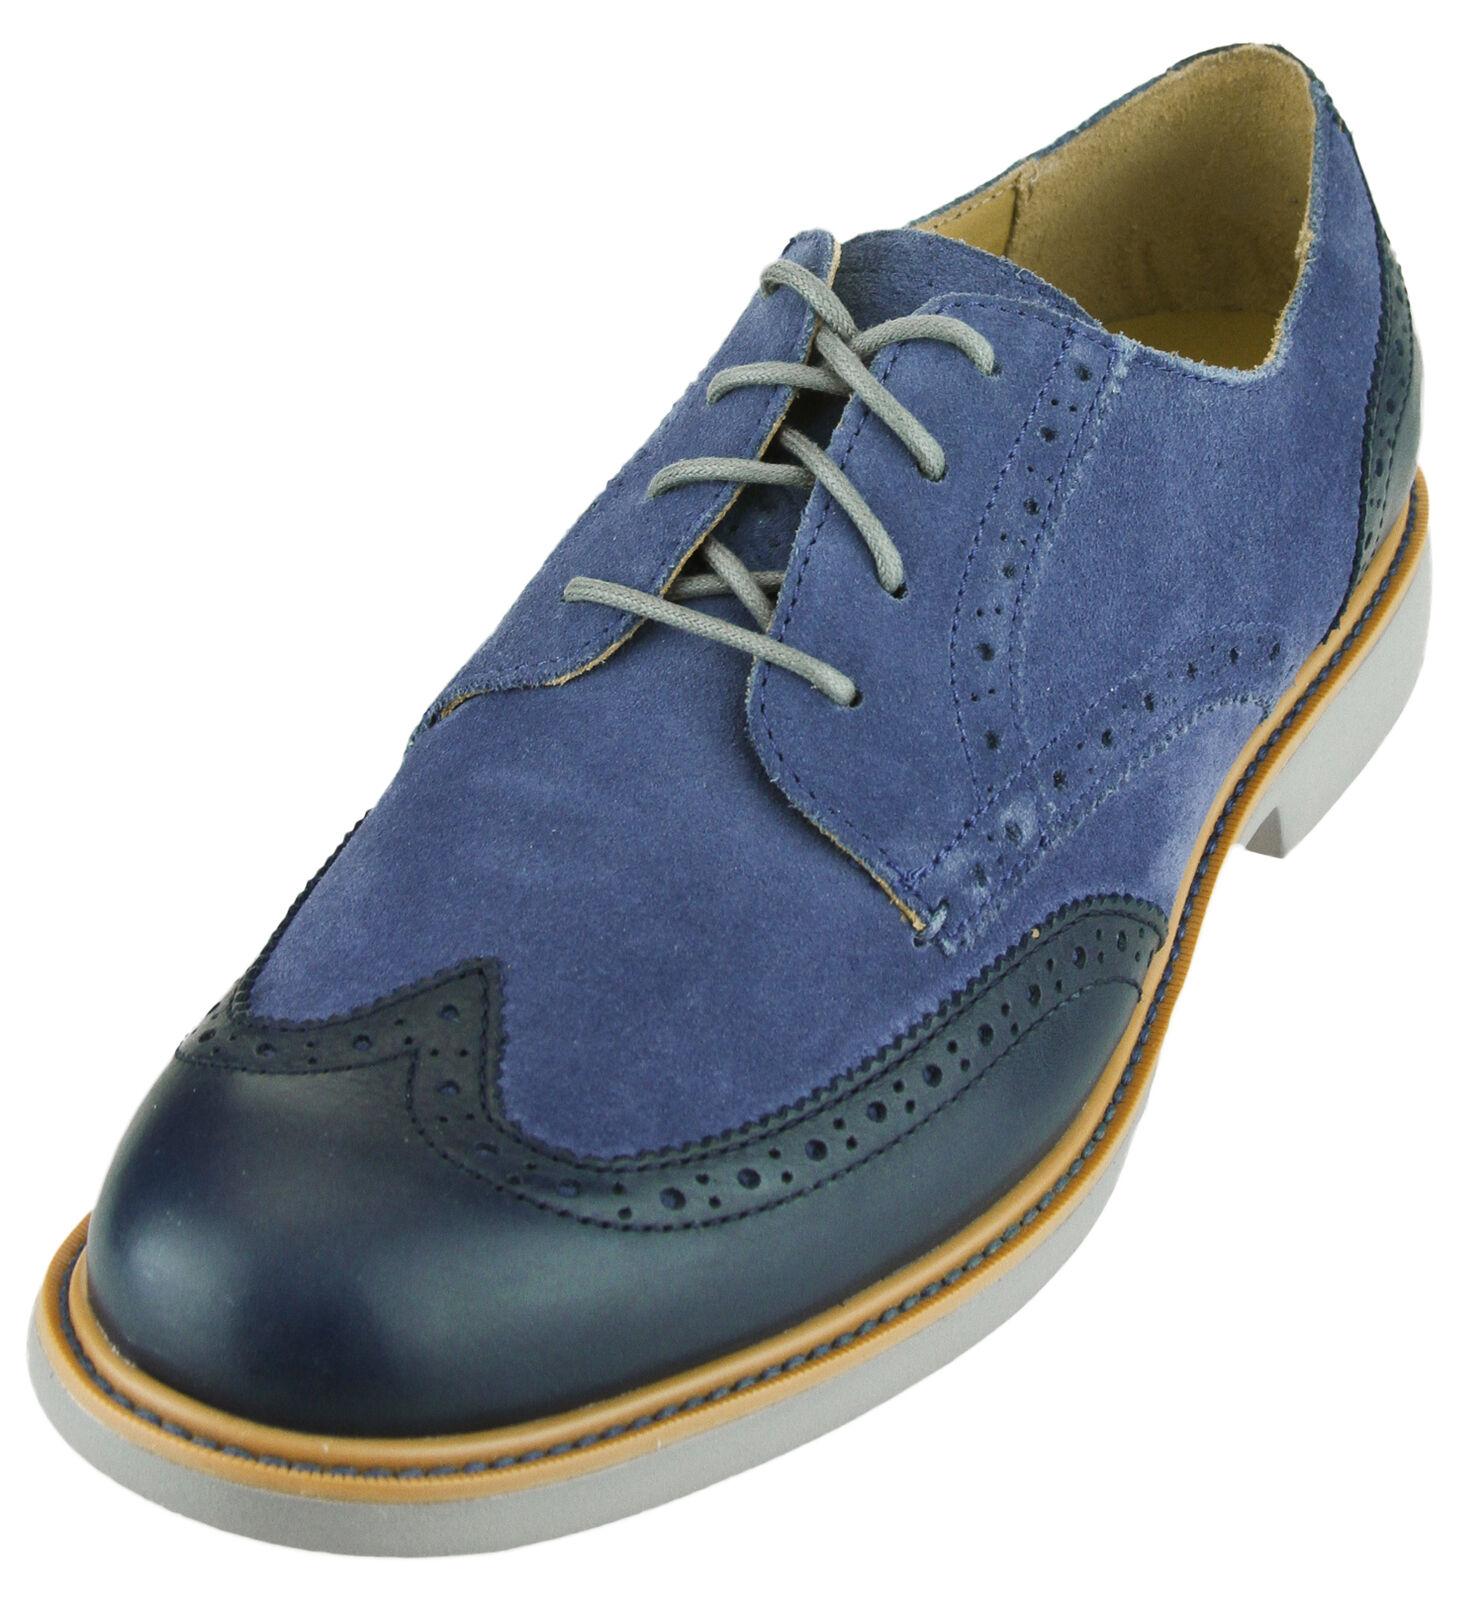 Cole Haan Men's Great Jones Wingtip II Lace Up Casual Dress Oxford shoes, bluee